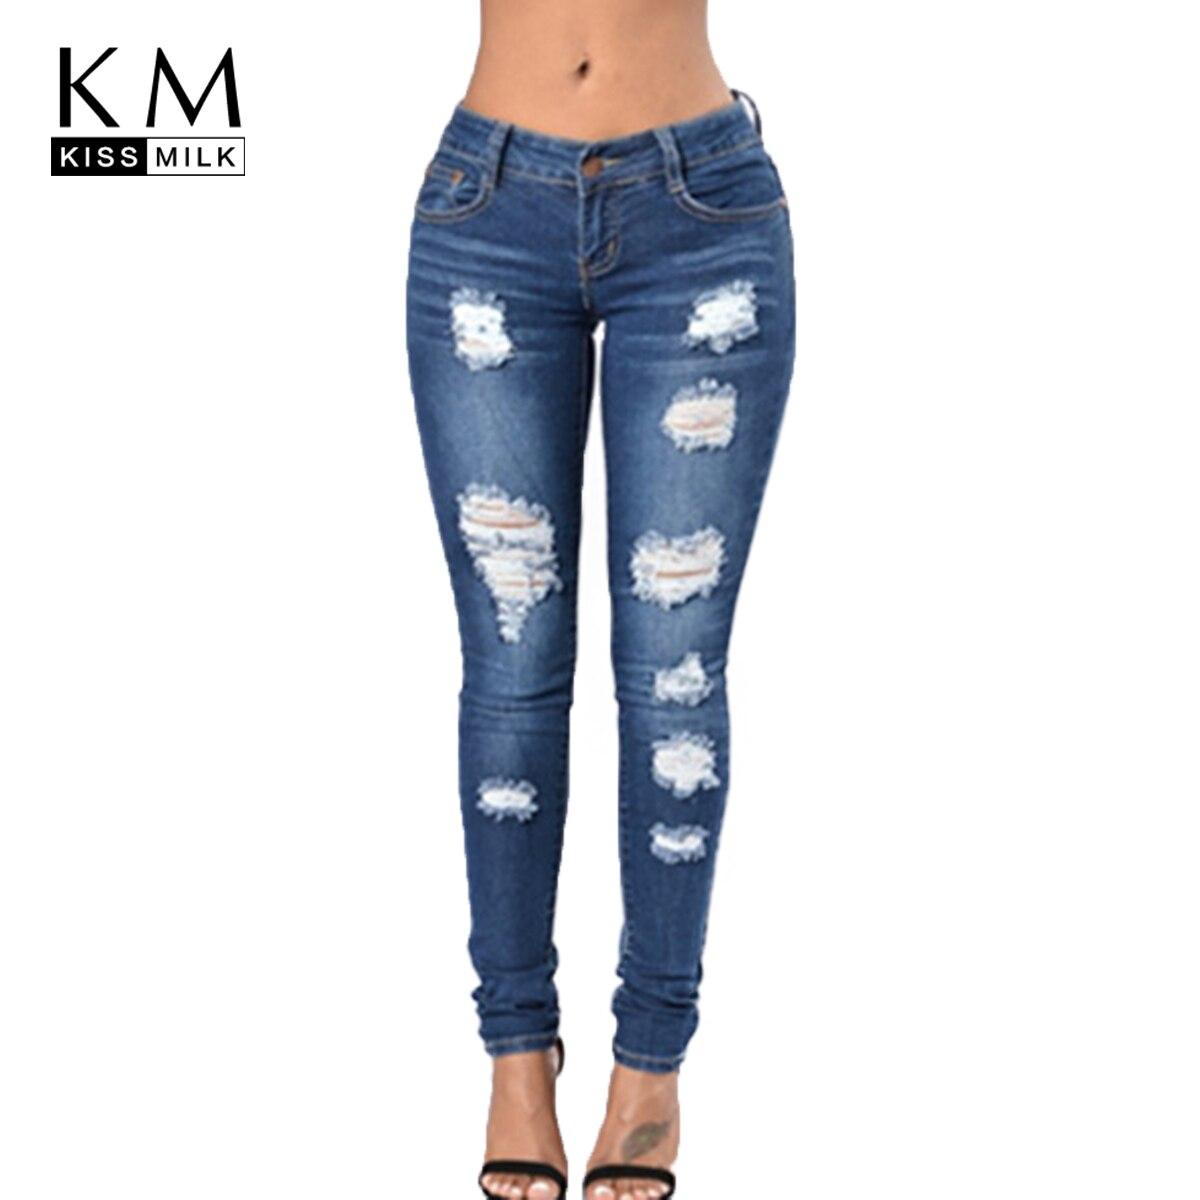 kissmilk 2018 autumn solid blue women jeans hole bleached. Black Bedroom Furniture Sets. Home Design Ideas